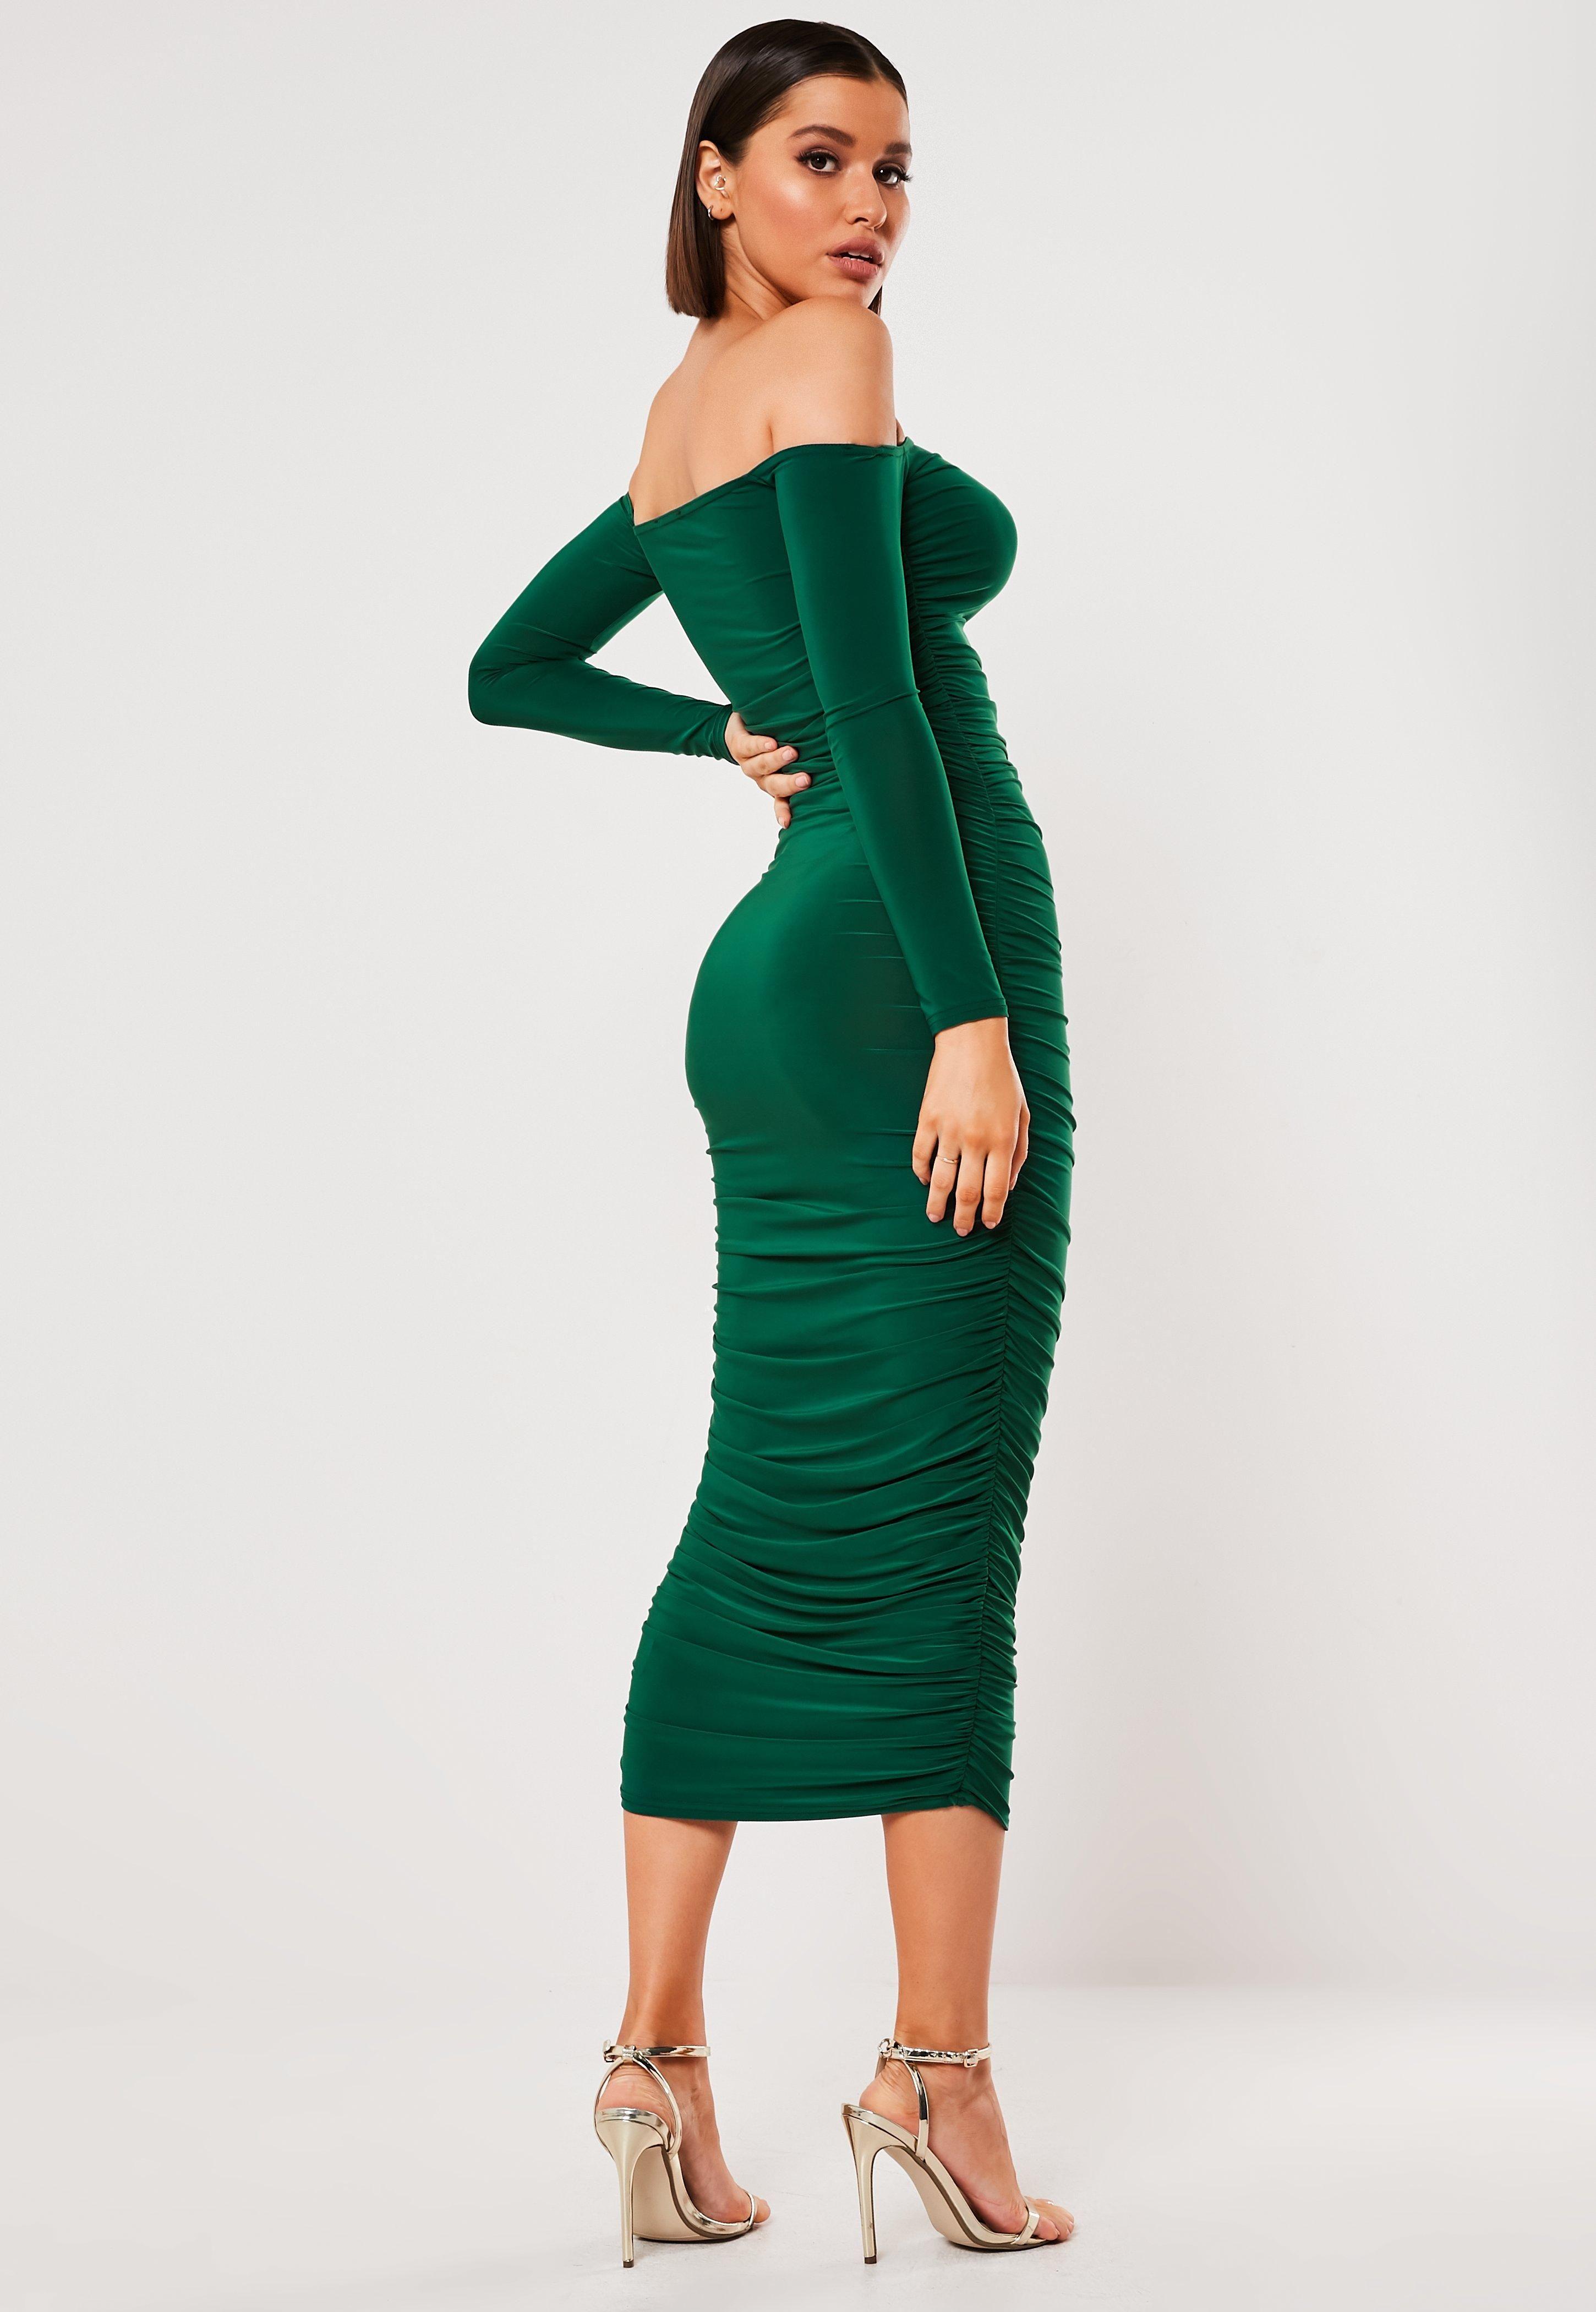 Dark Green Bardot Slinky Ruched Bodycon Midaxi Dress Sponsored Bardot Aff Slinky Dark Dresses Over The Shoulder Dress Ruched Bodycon Dress [ 4200 x 2900 Pixel ]